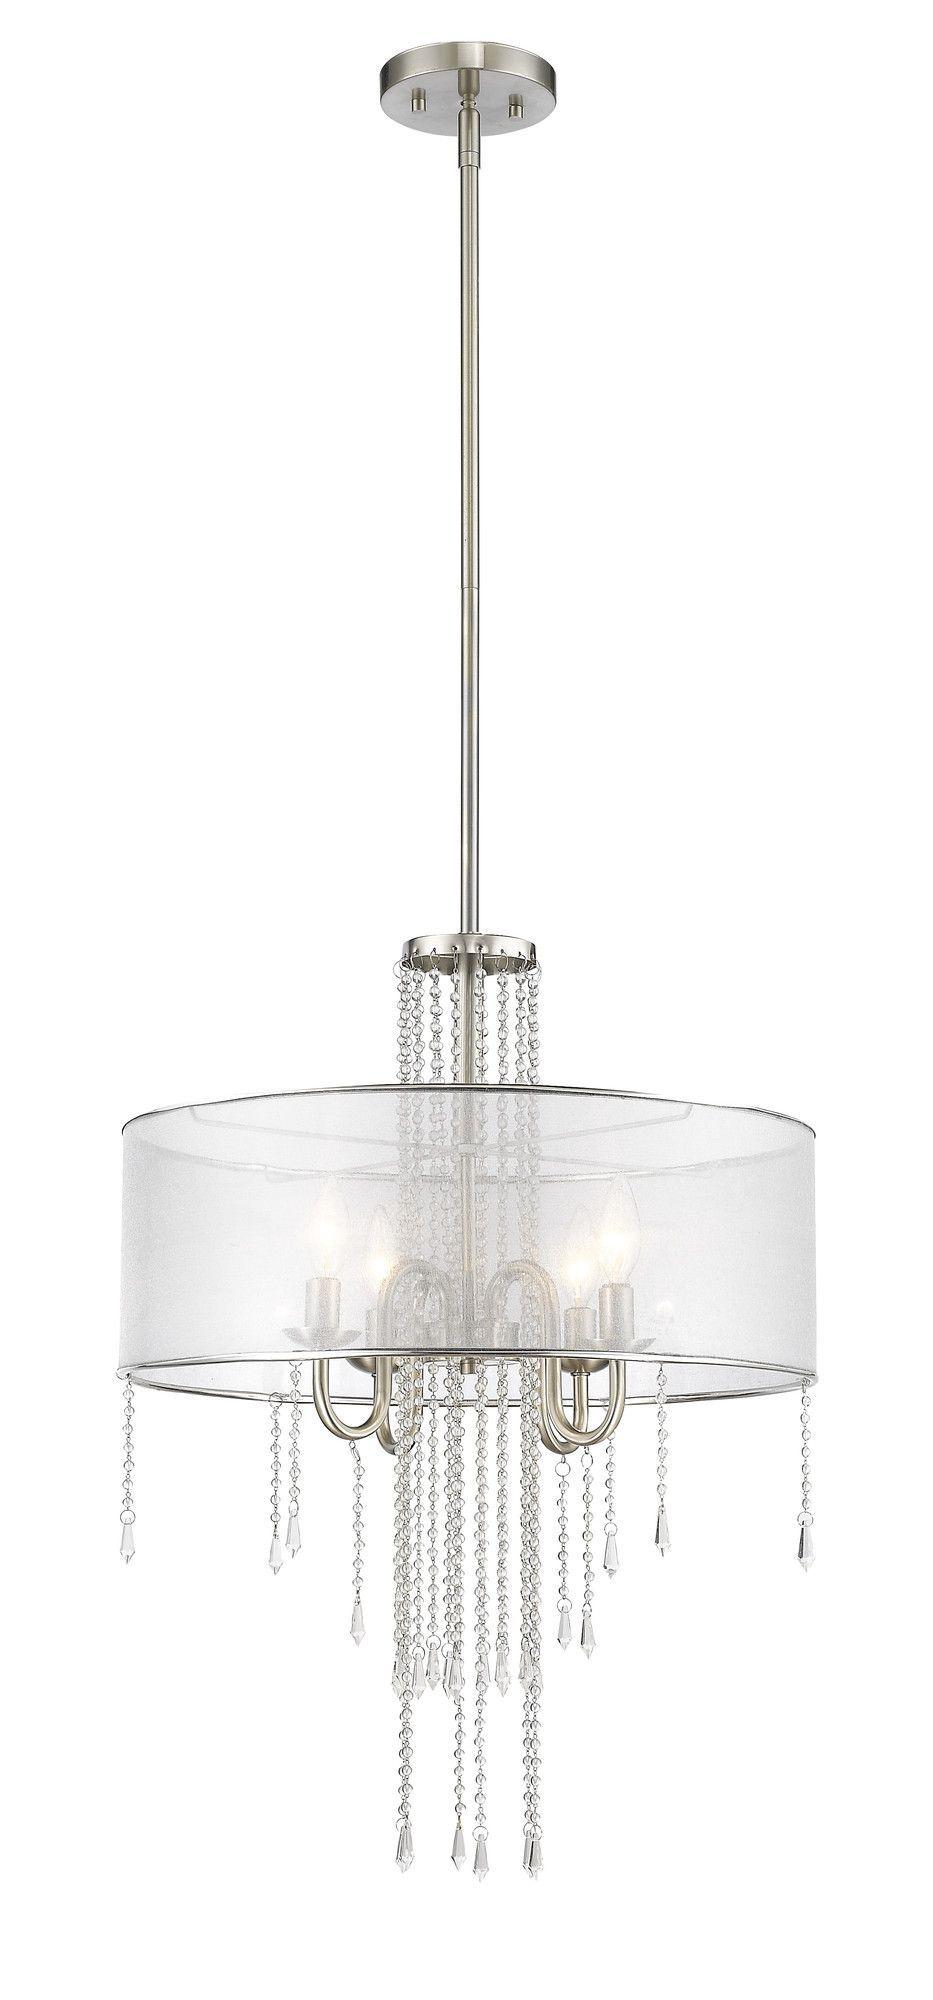 Siena 4 Light Crystal Chandelier